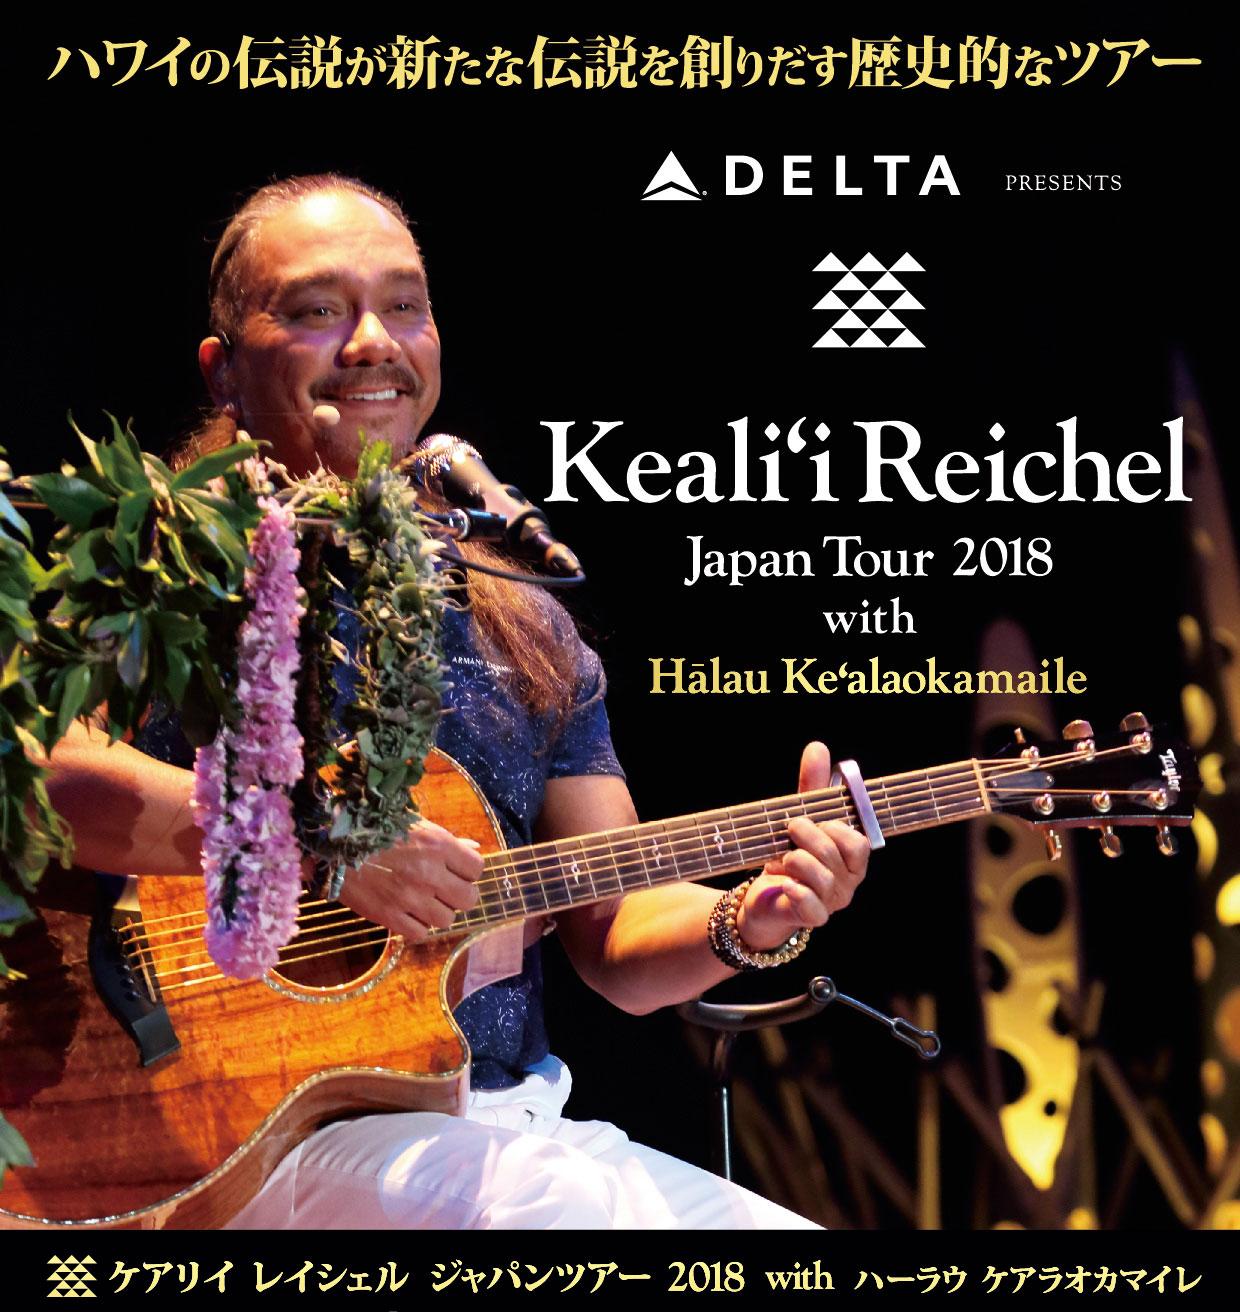 DELTA presents Keali'i Reichel Japan Tour 2018